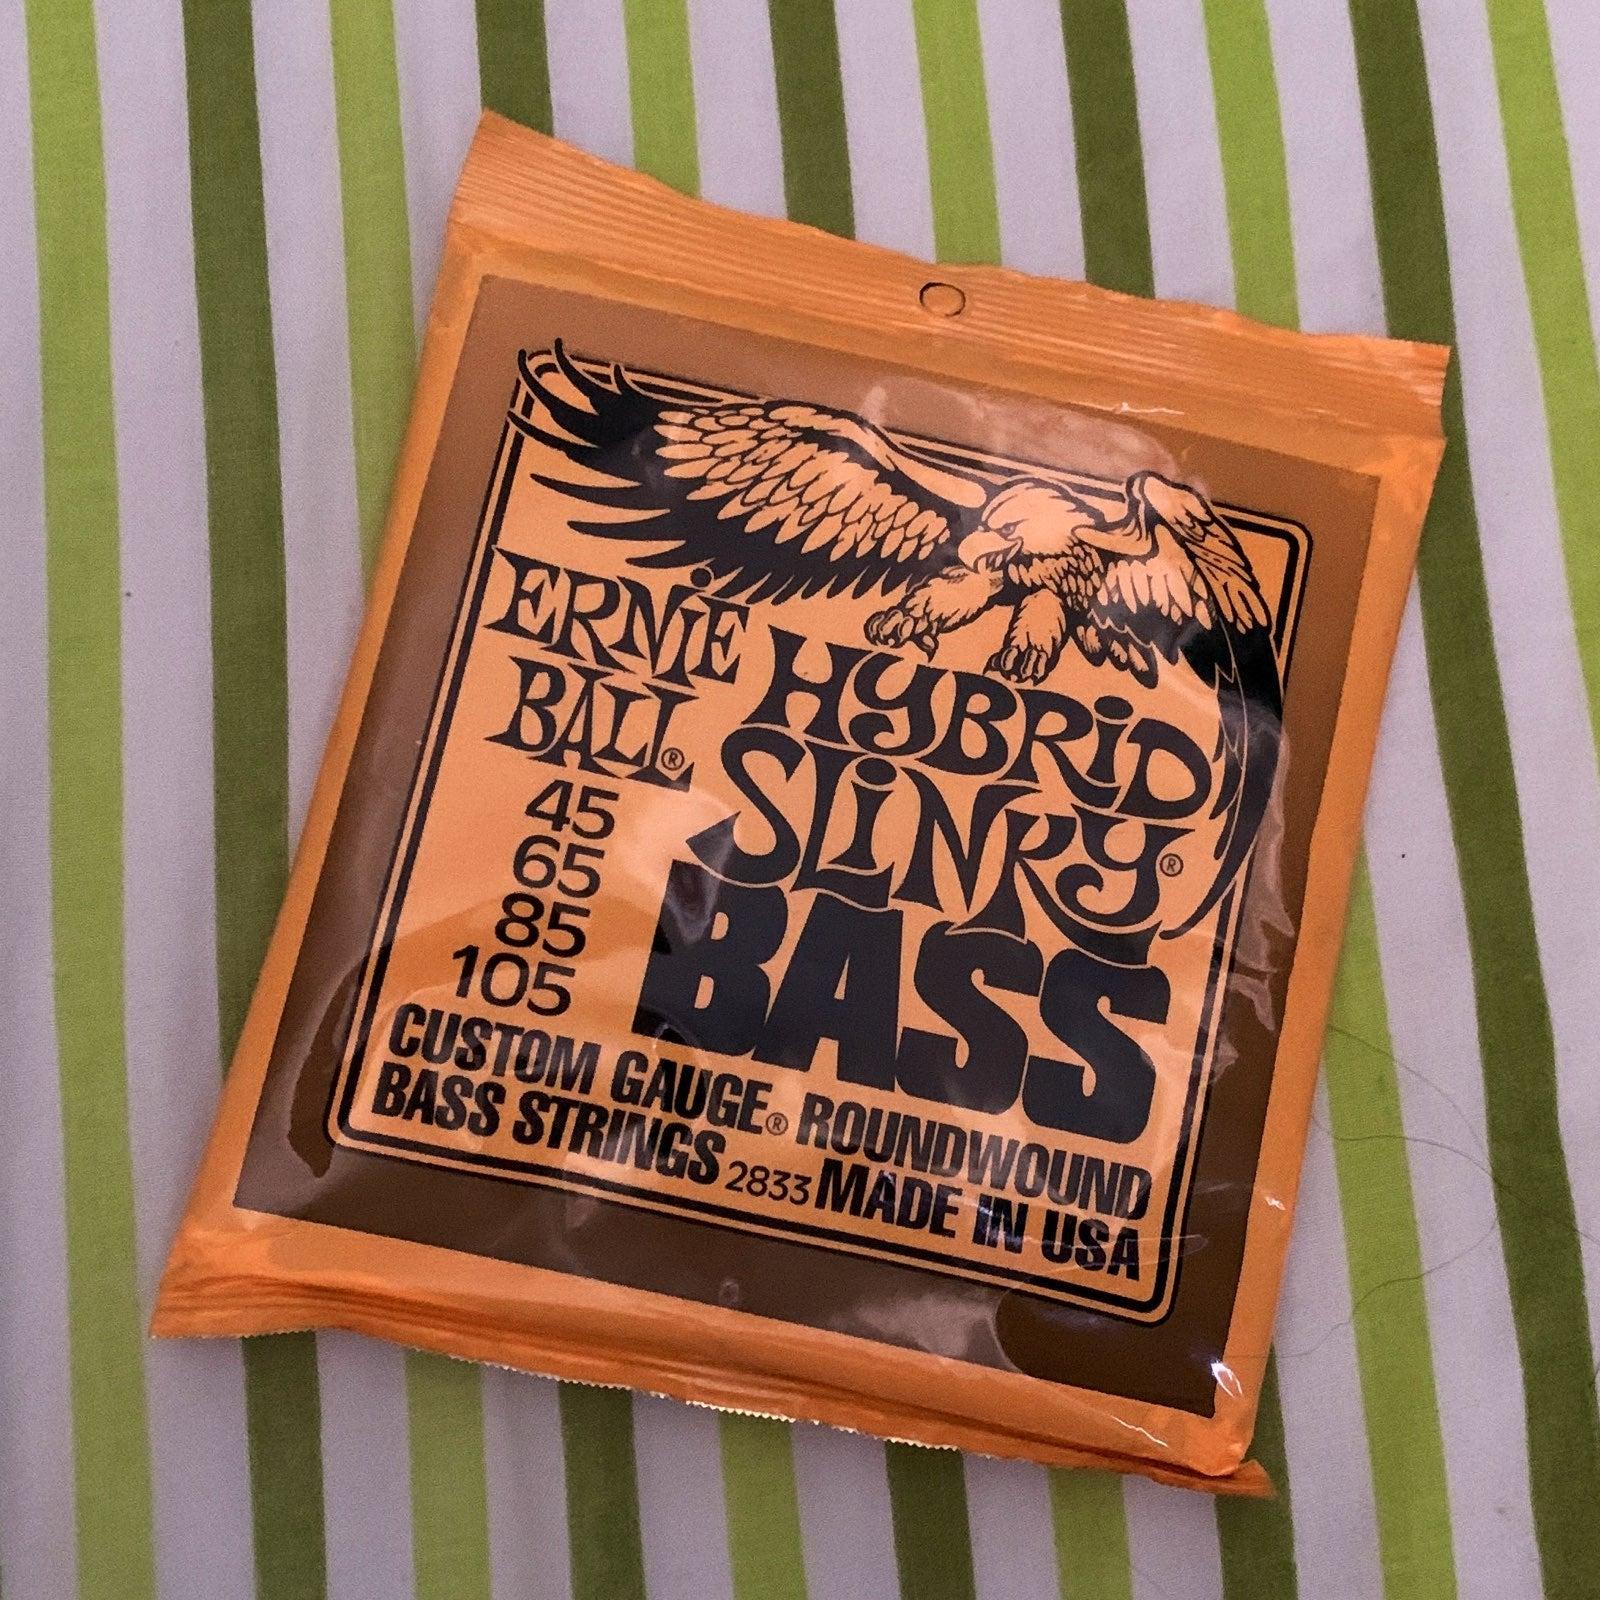 Ernie Ball Bass Slinky Strings